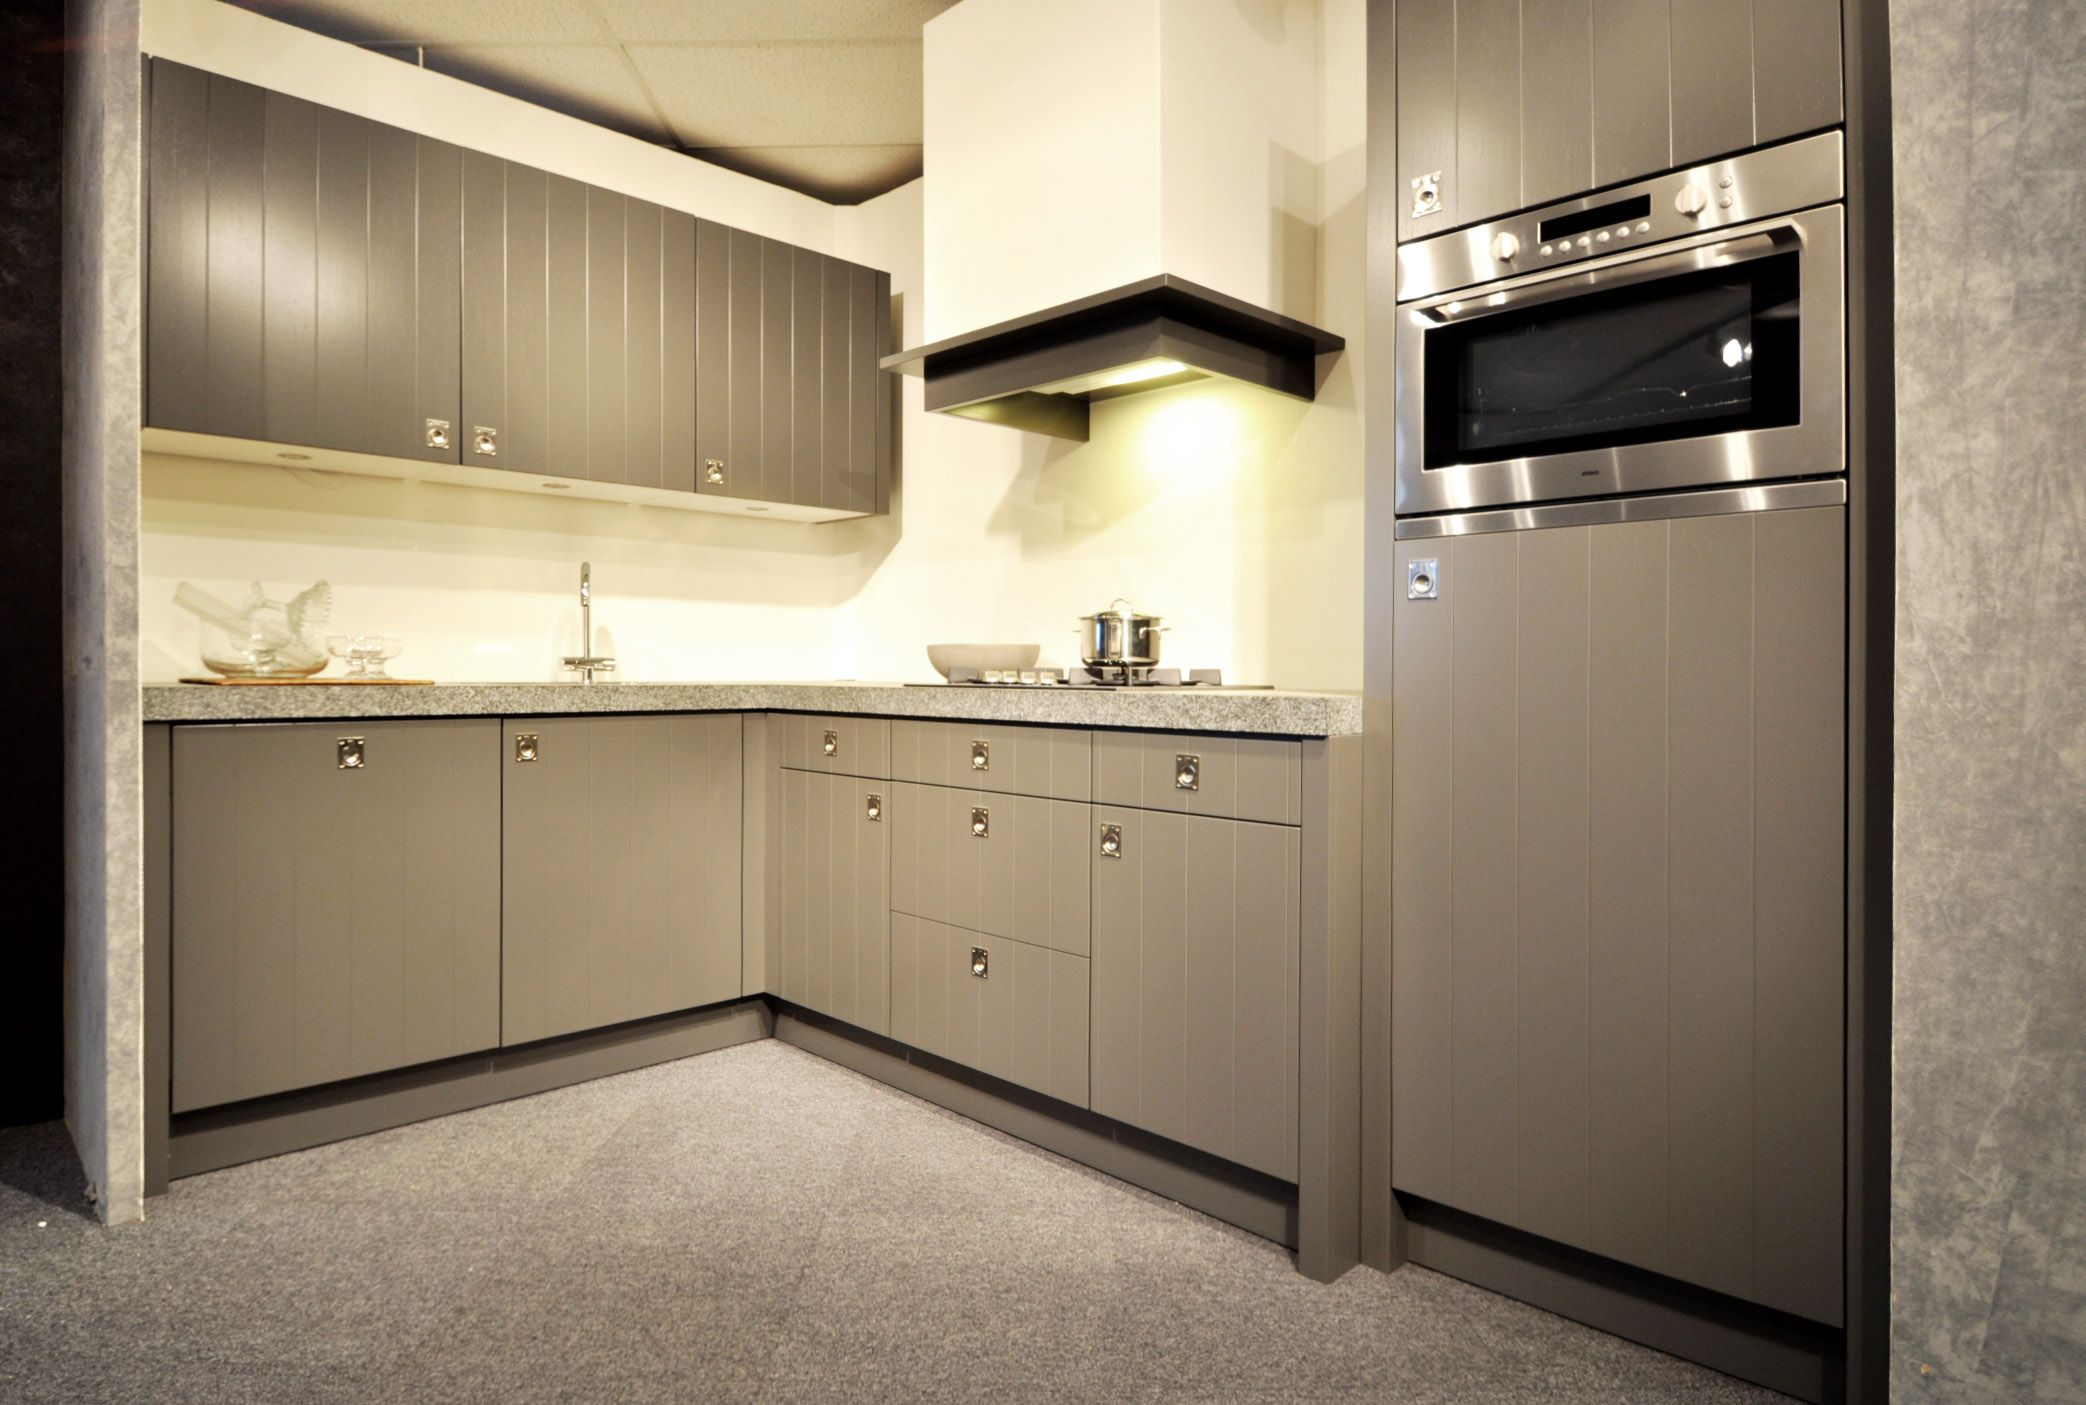 Hoek Keuken Modellen : Keukenstekoop het grootste keukenaanbod van nederland